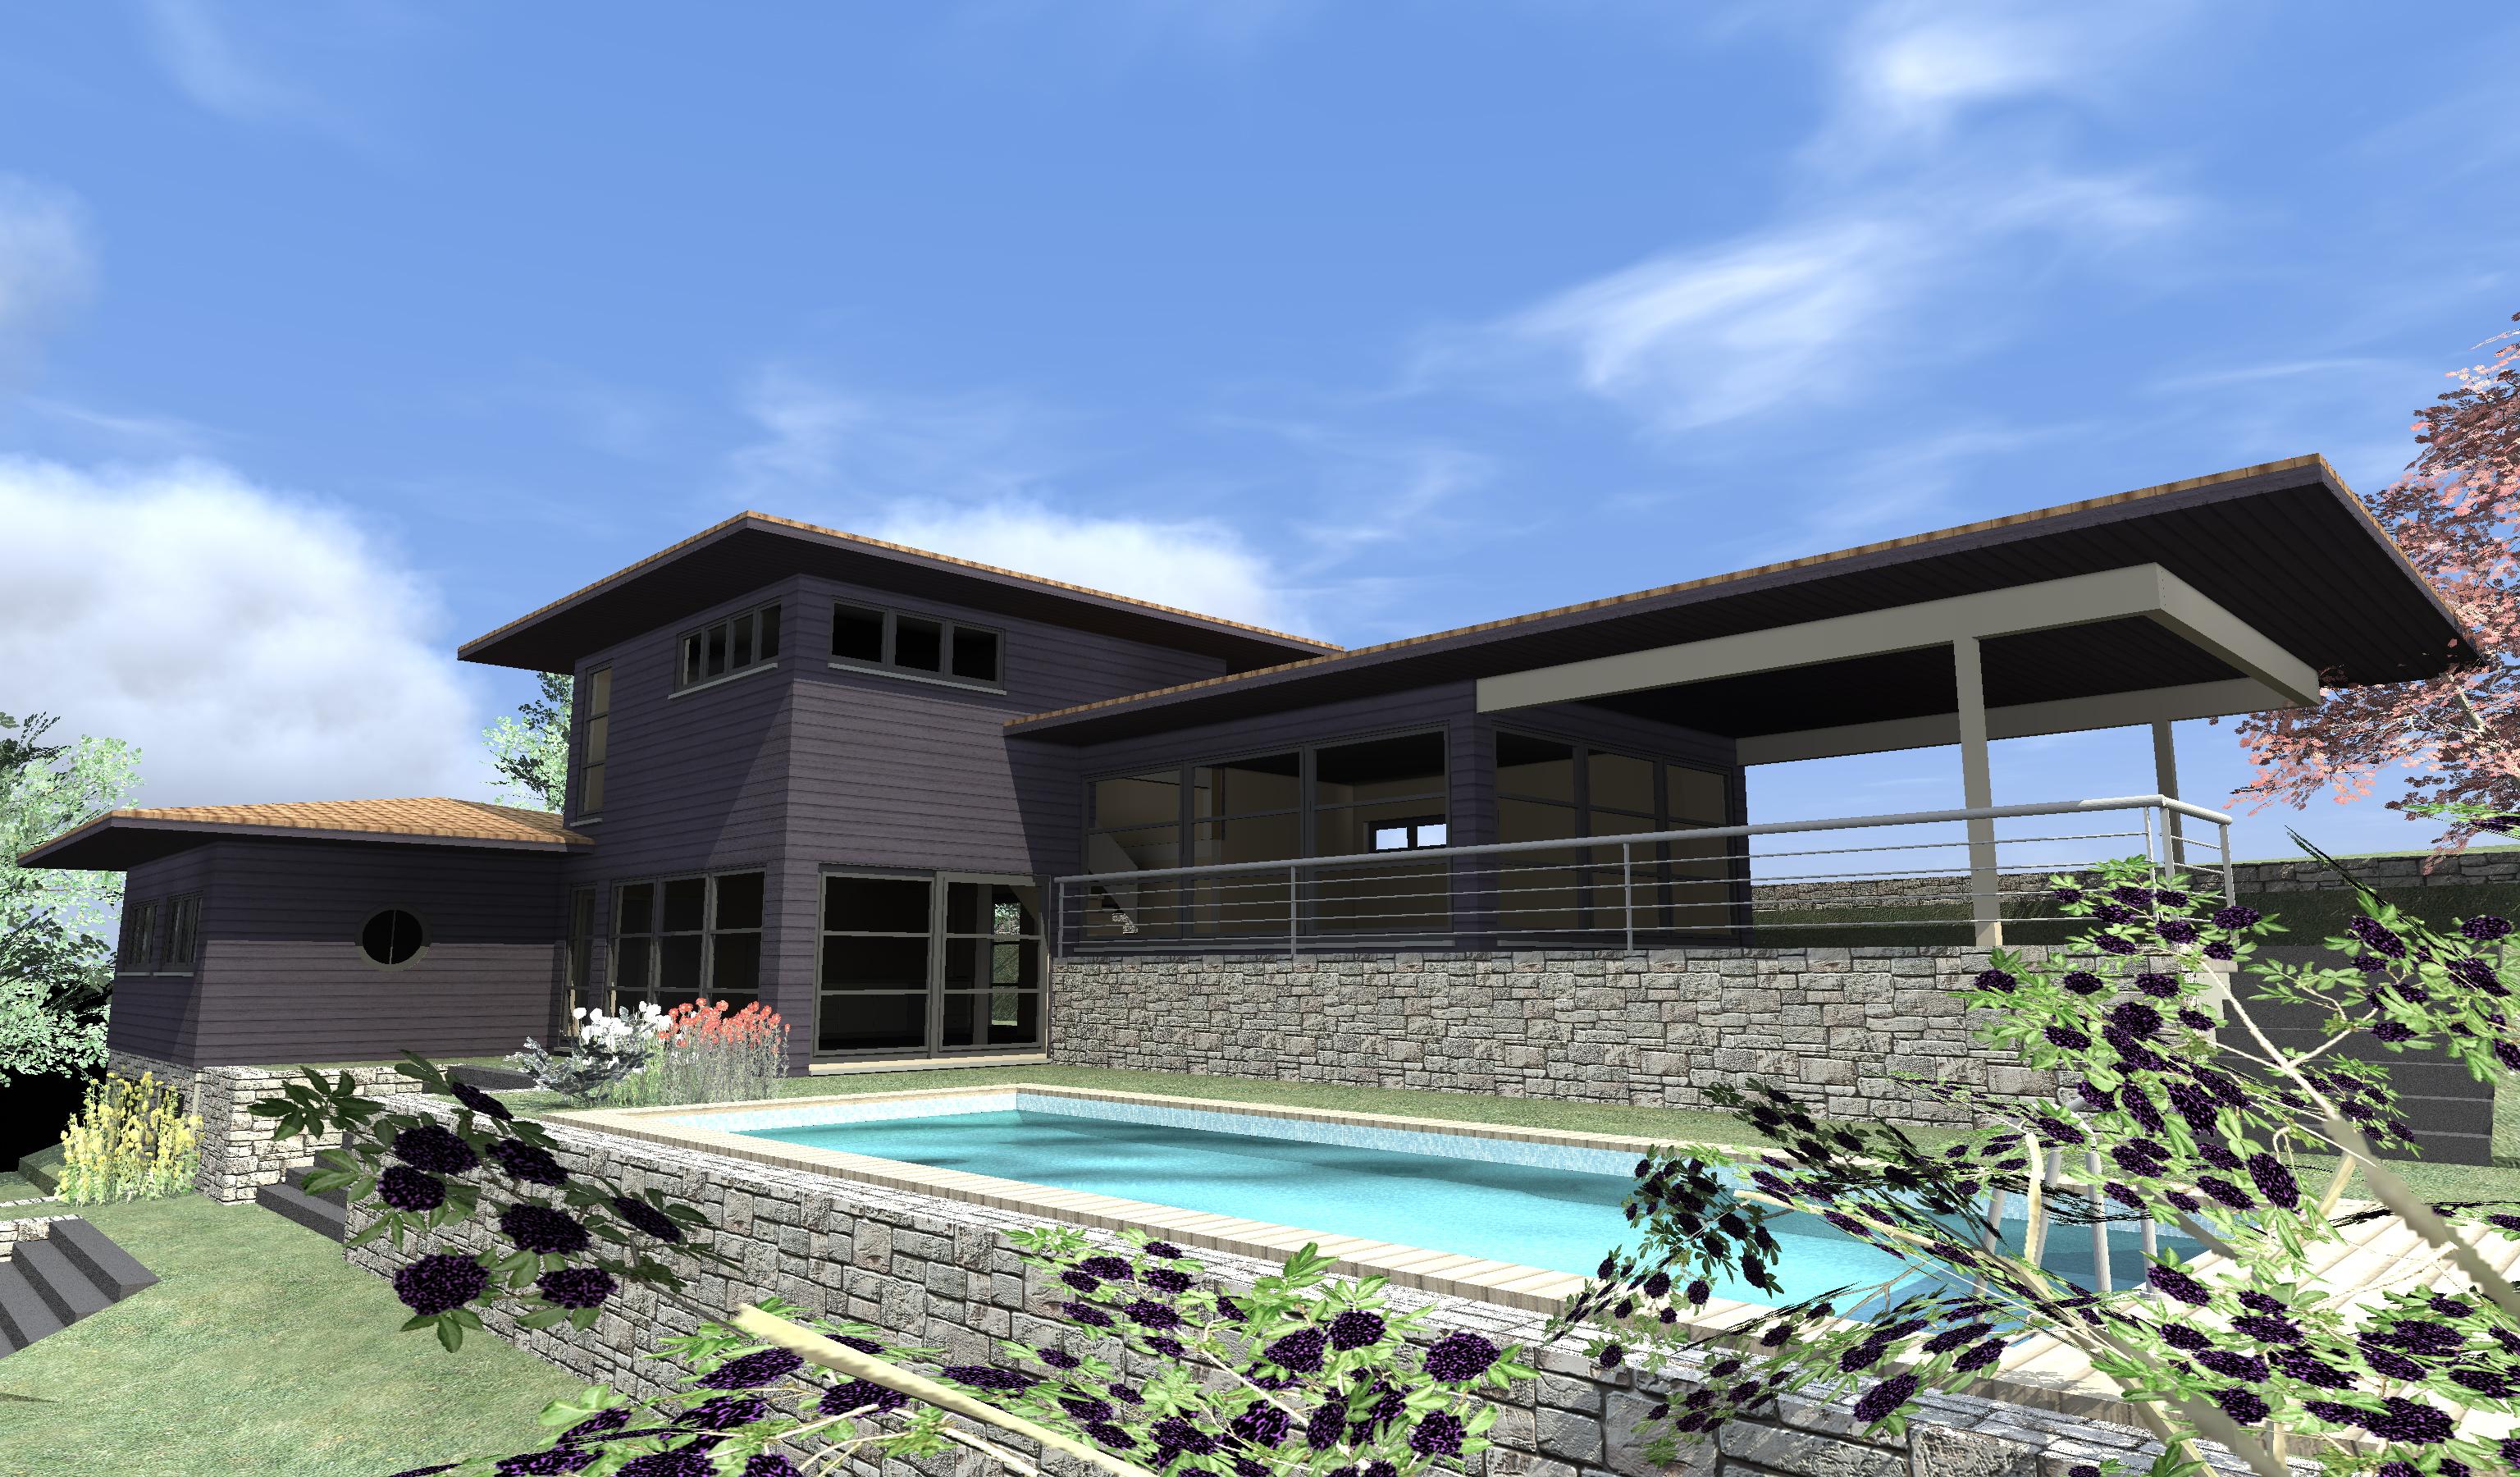 maison moderne maison bois c t sud. Black Bedroom Furniture Sets. Home Design Ideas